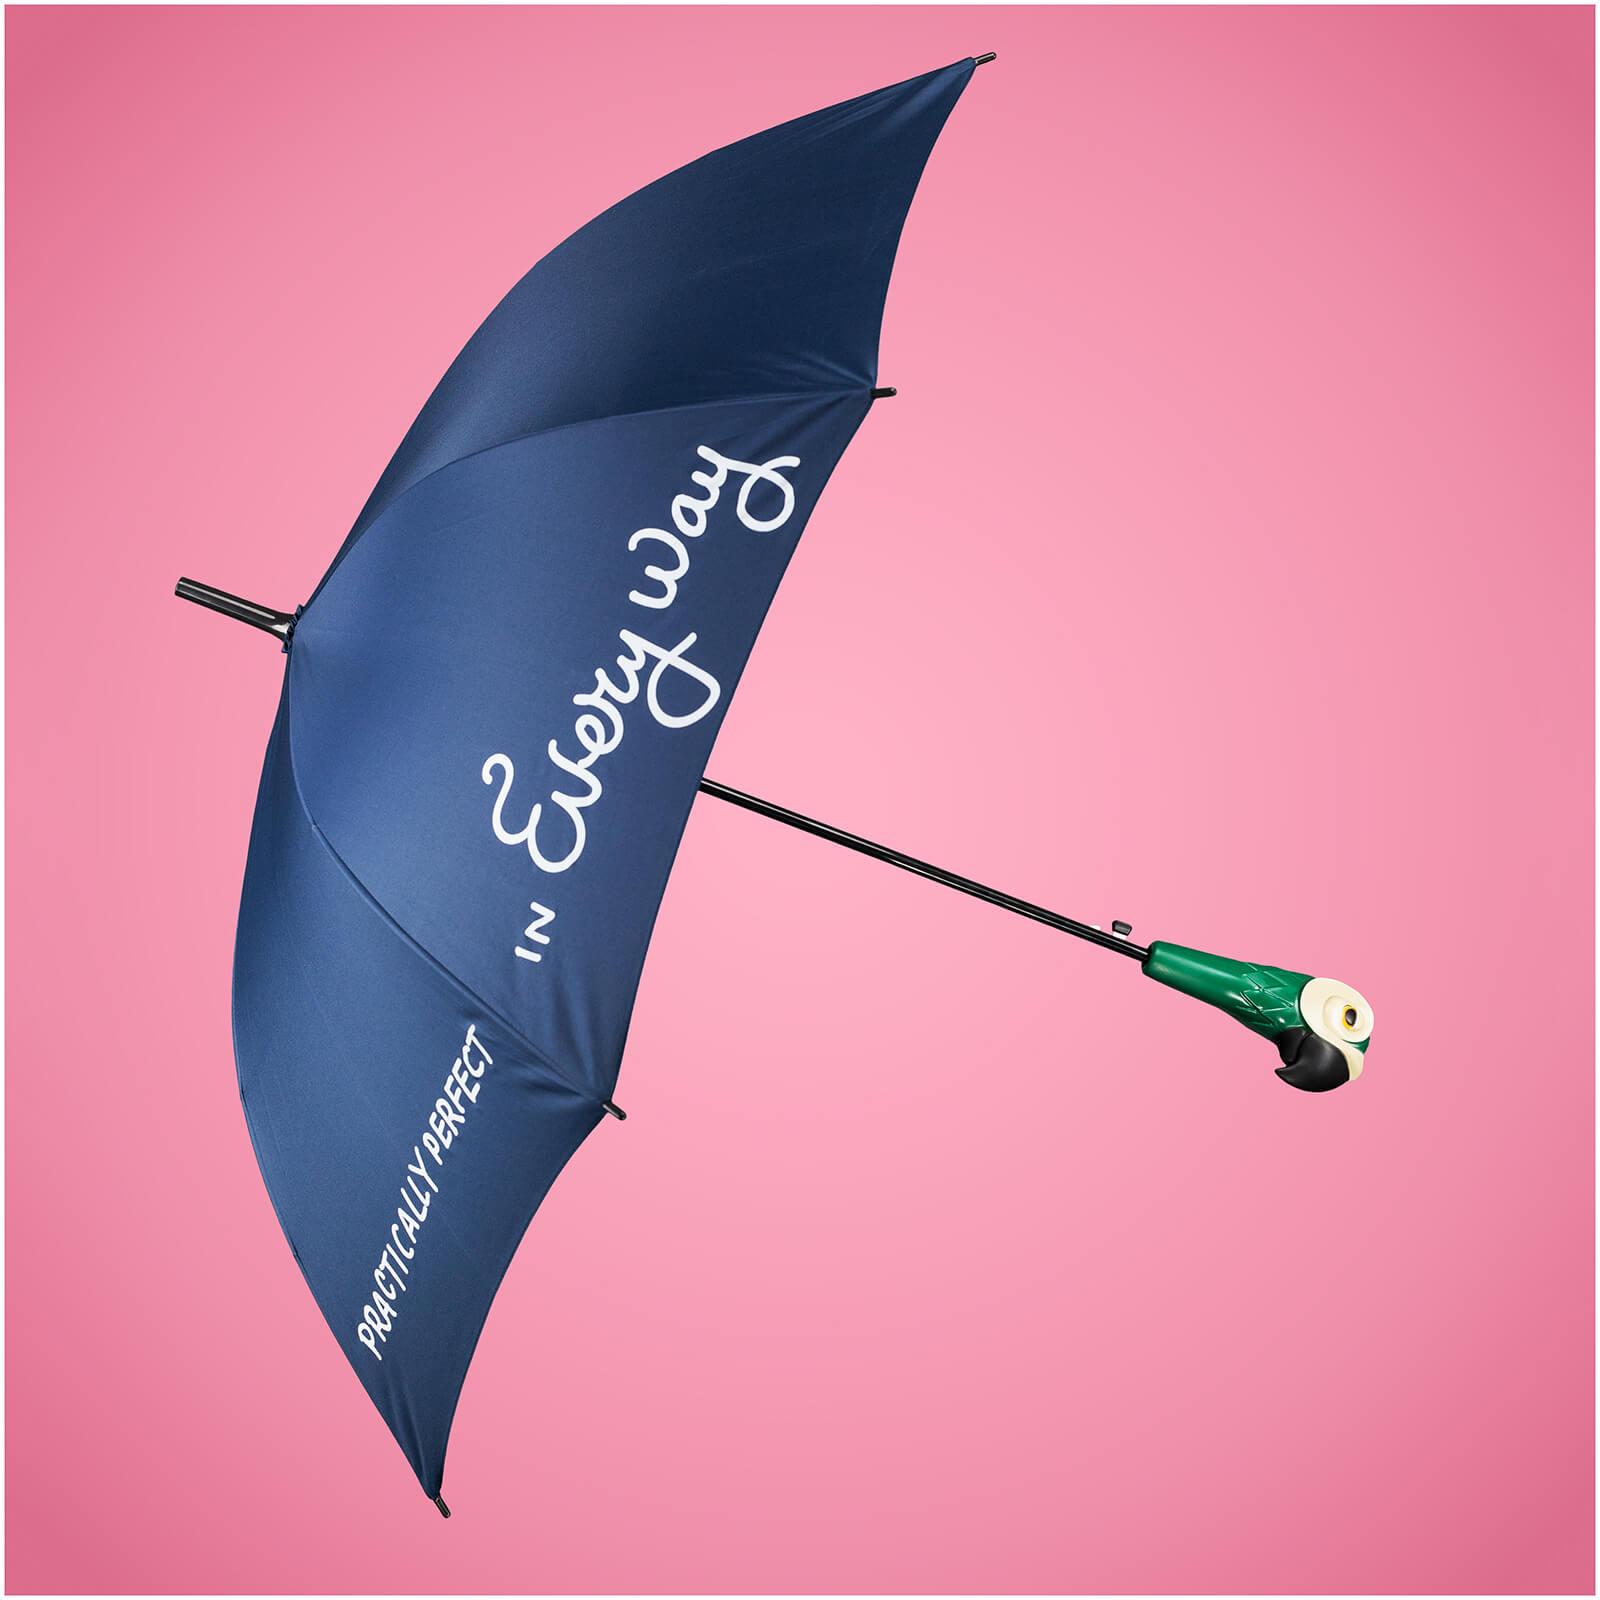 Paladone Mary Poppins Regenschirm